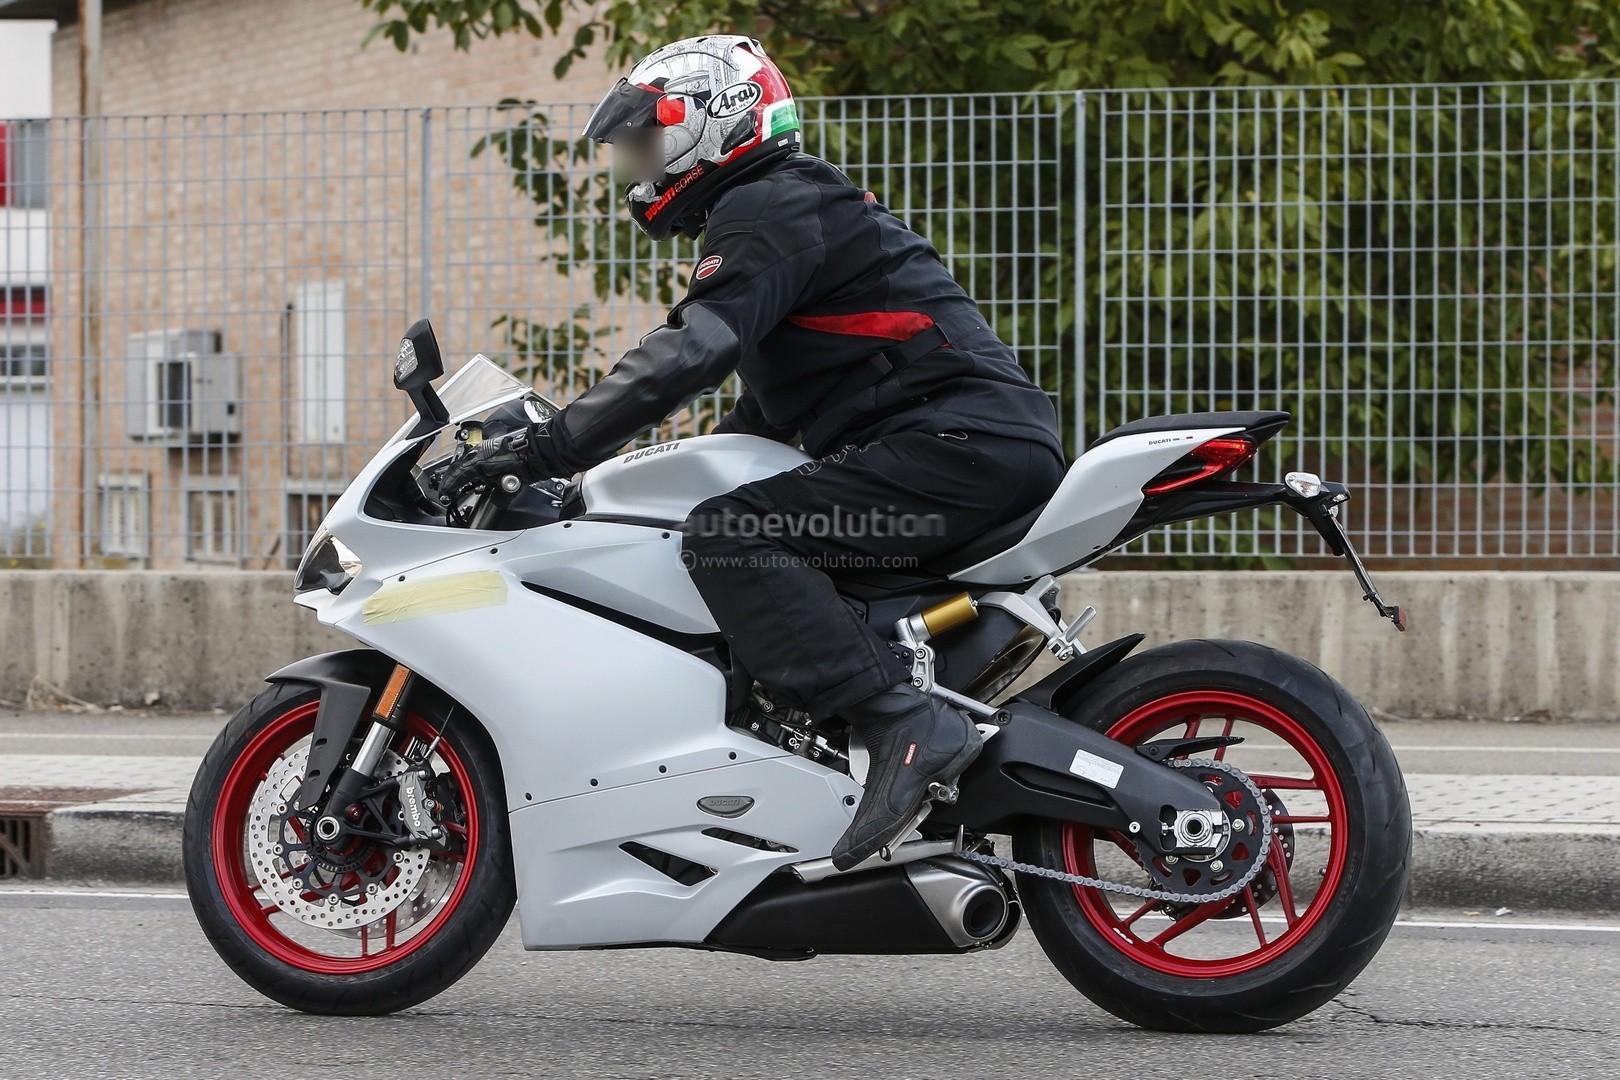 New Ducati Bike Price